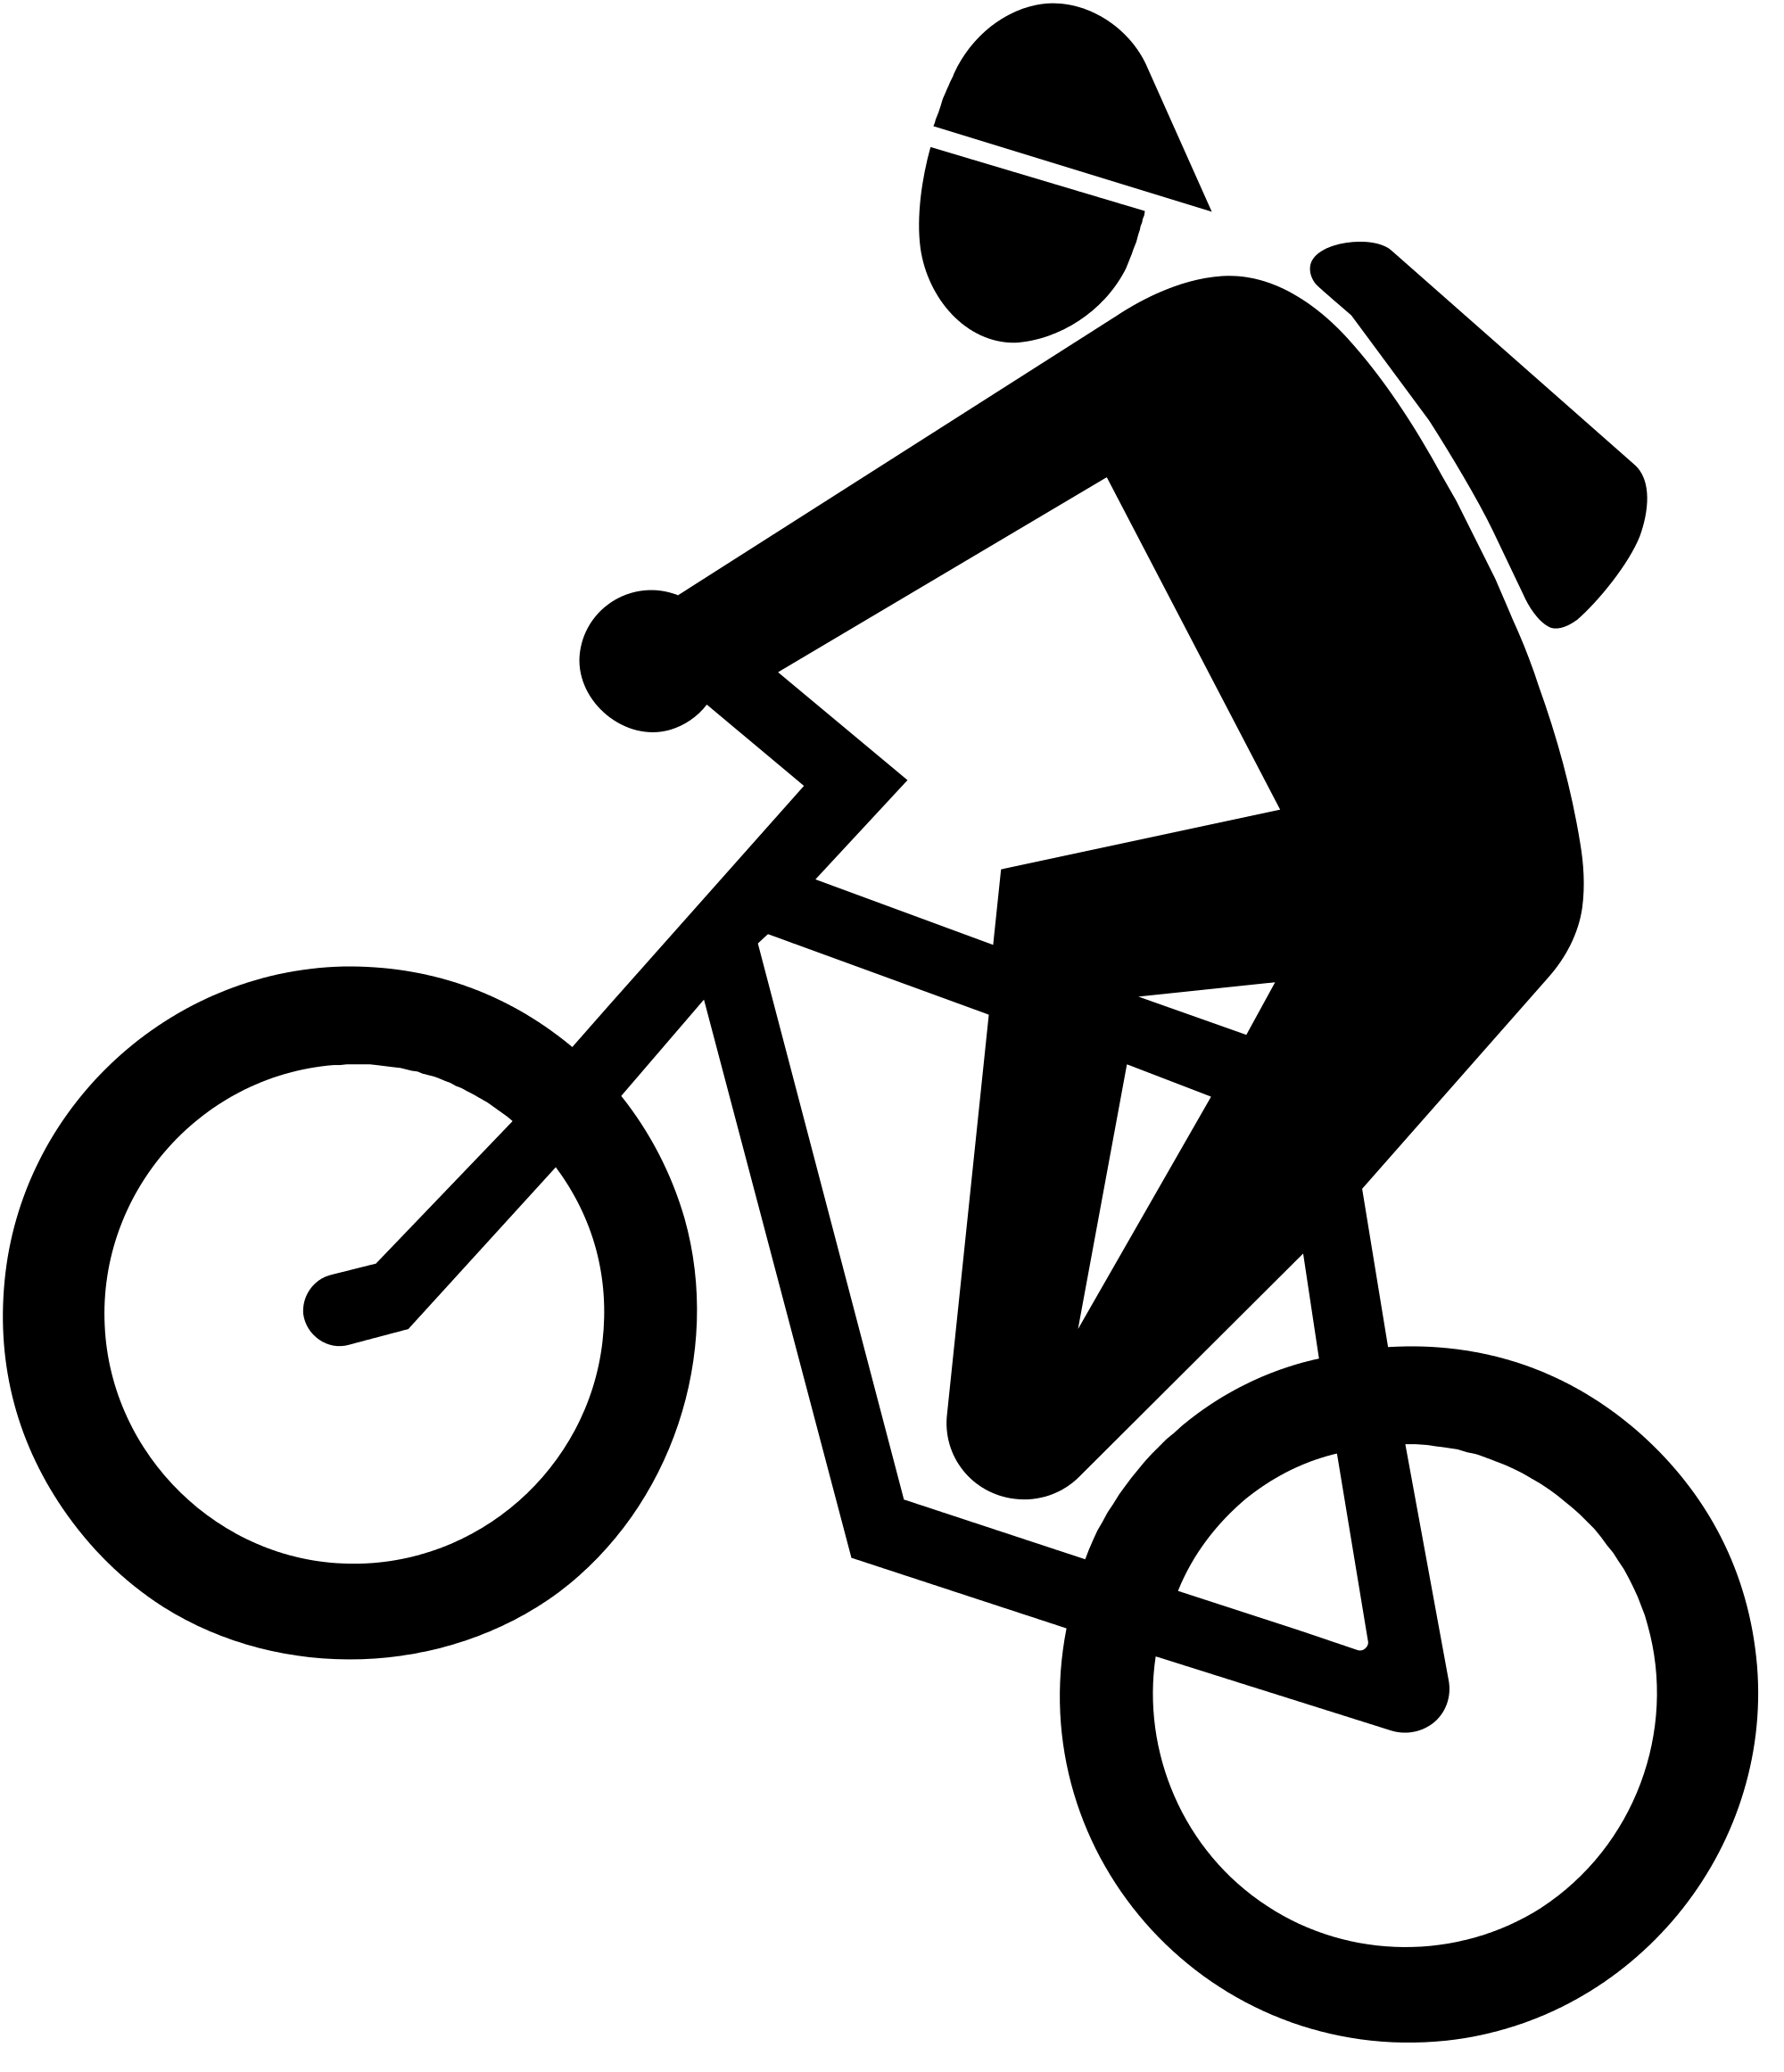 File ch zusatztafel mountain. Clipart mountains cycling